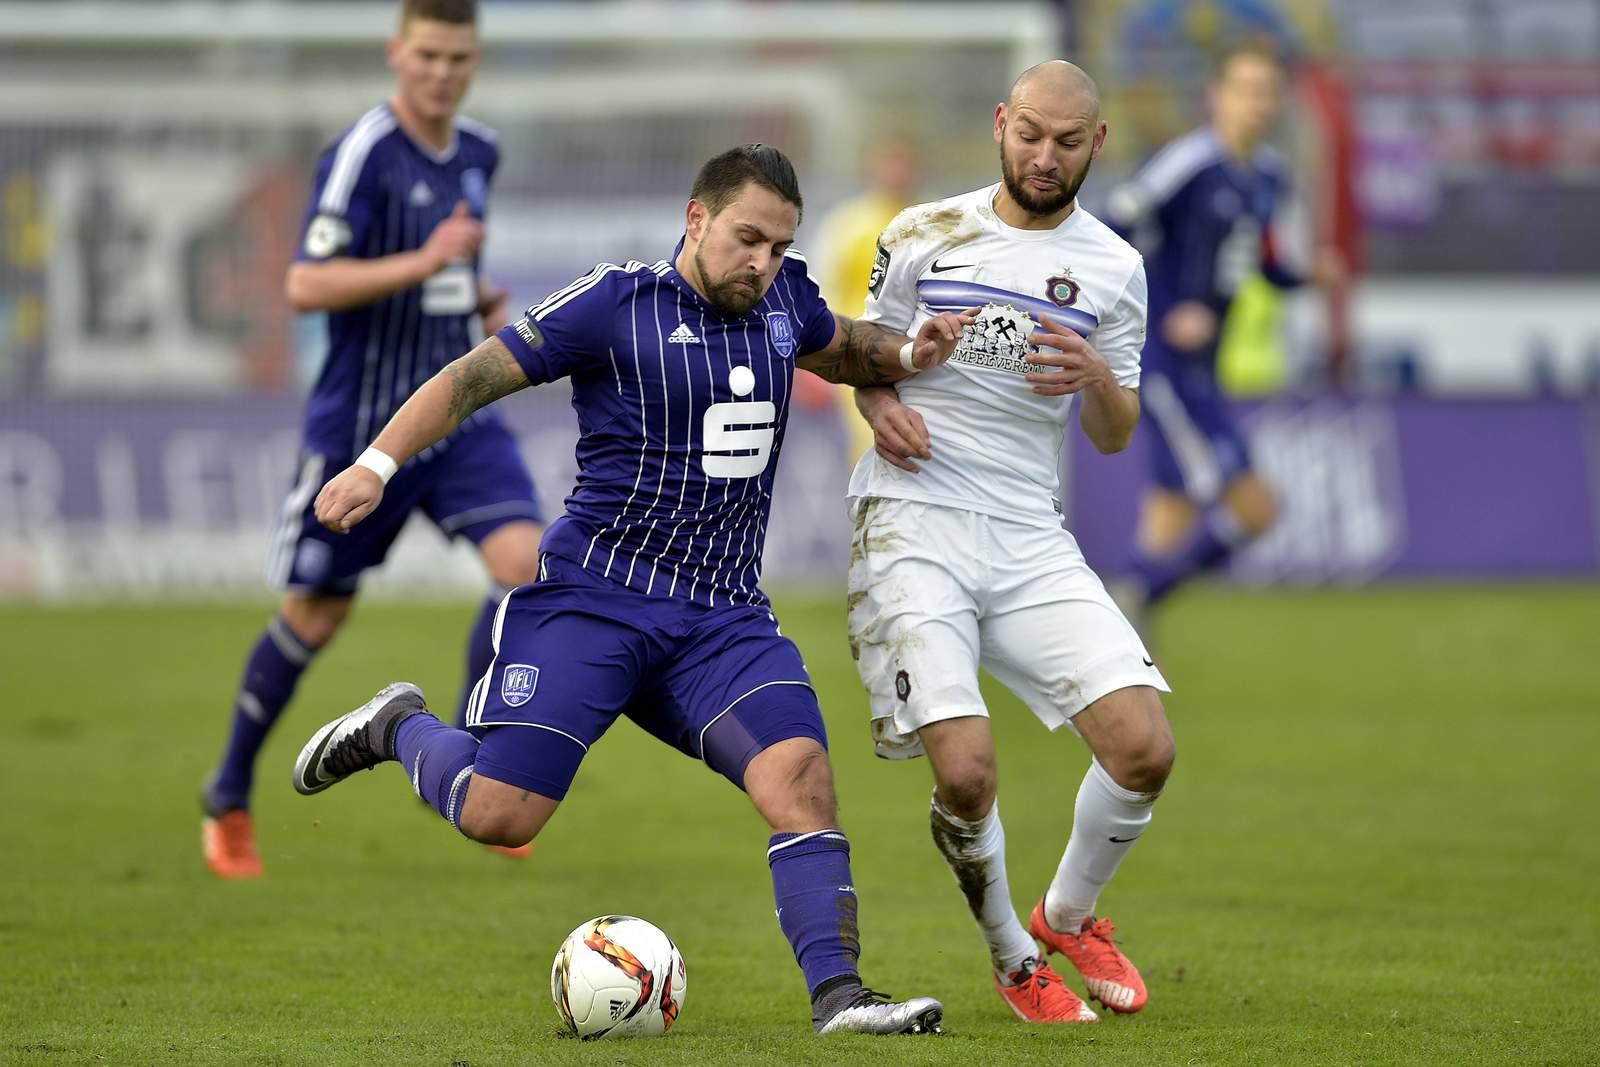 Soi kèo Sandhausen vs Wiesbaden